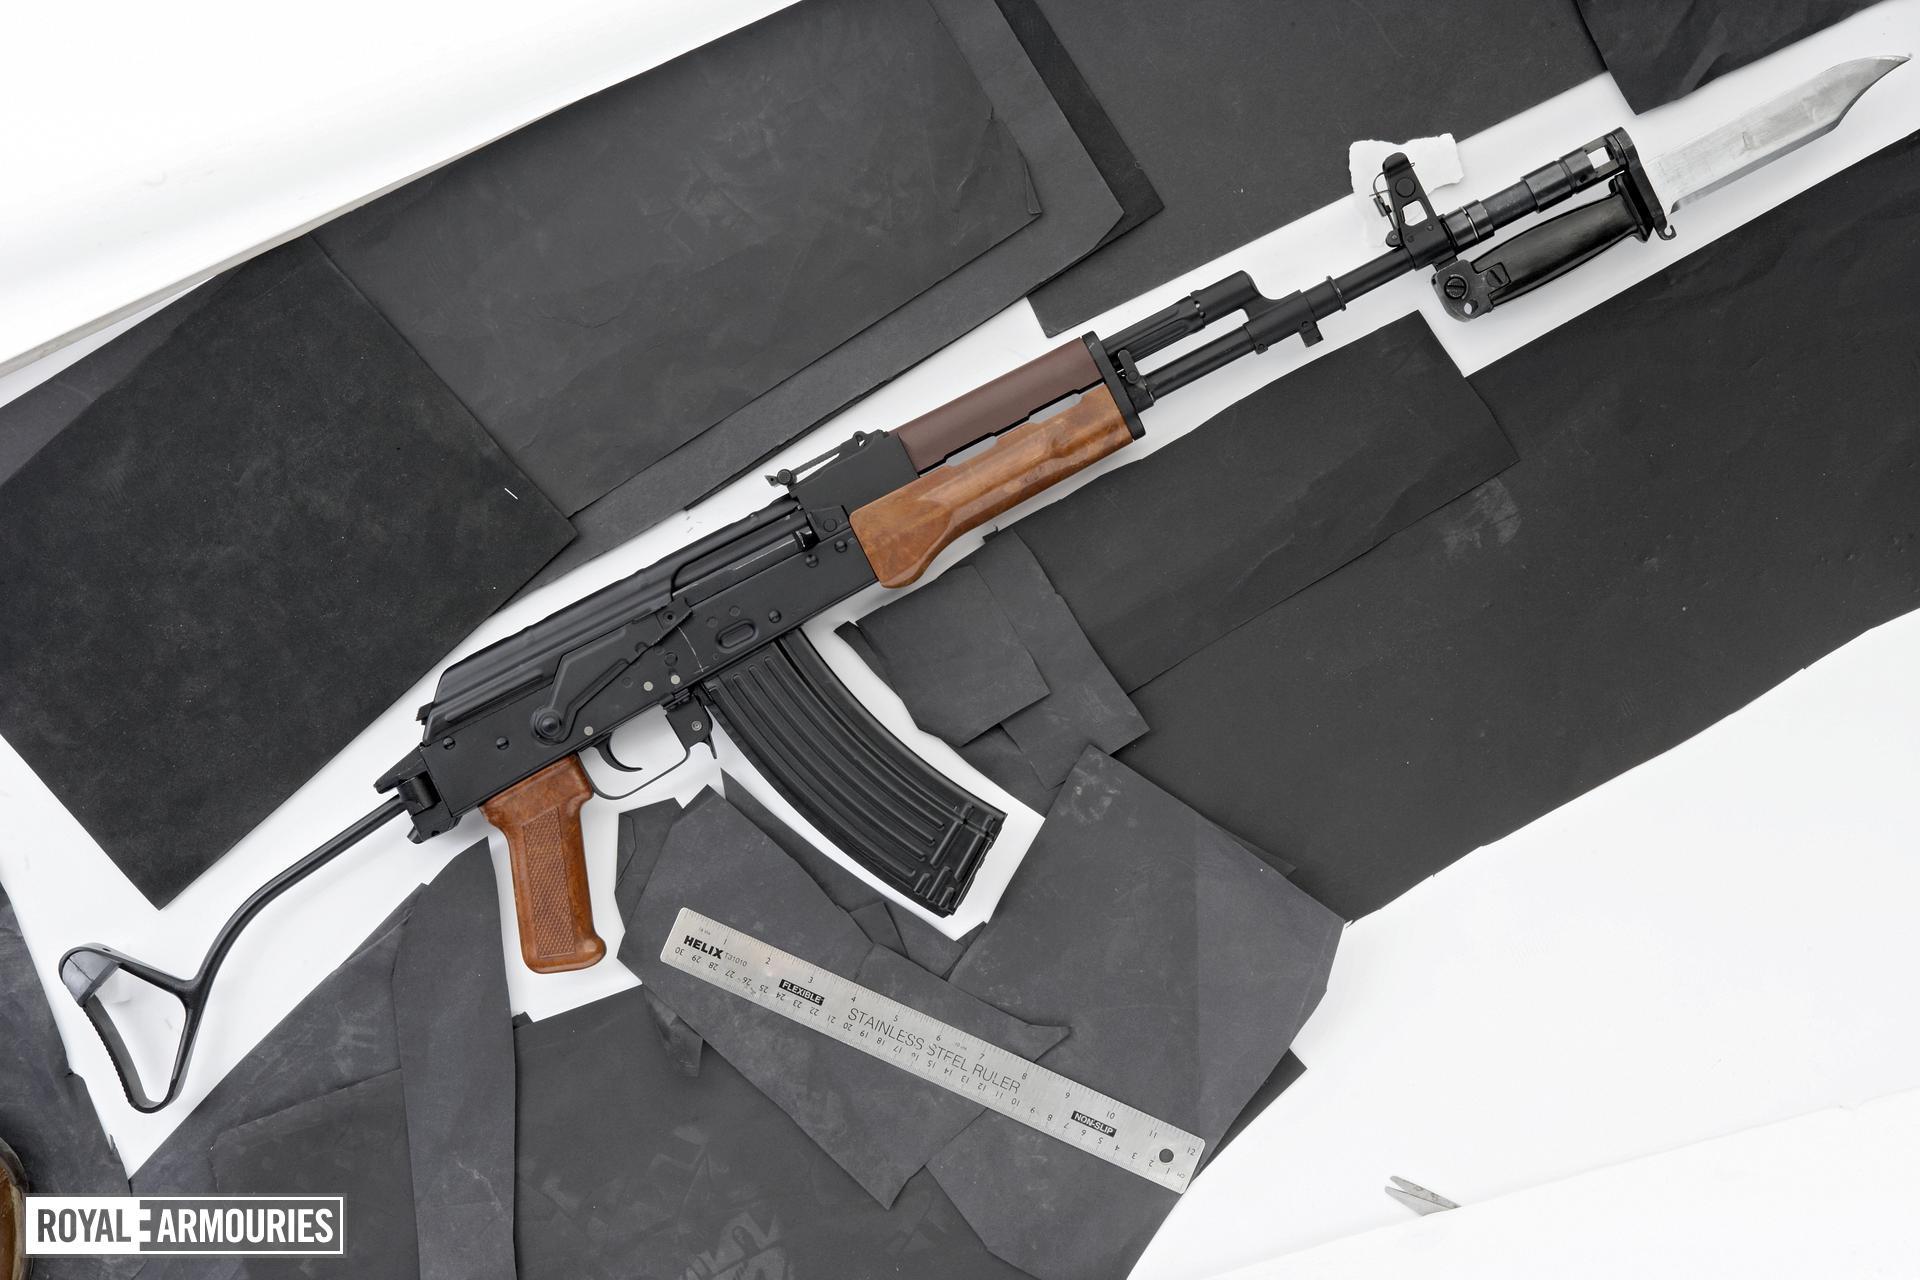 Centrefire automatic carbine - Kalashnikov KA wz.88 (AKS-74)